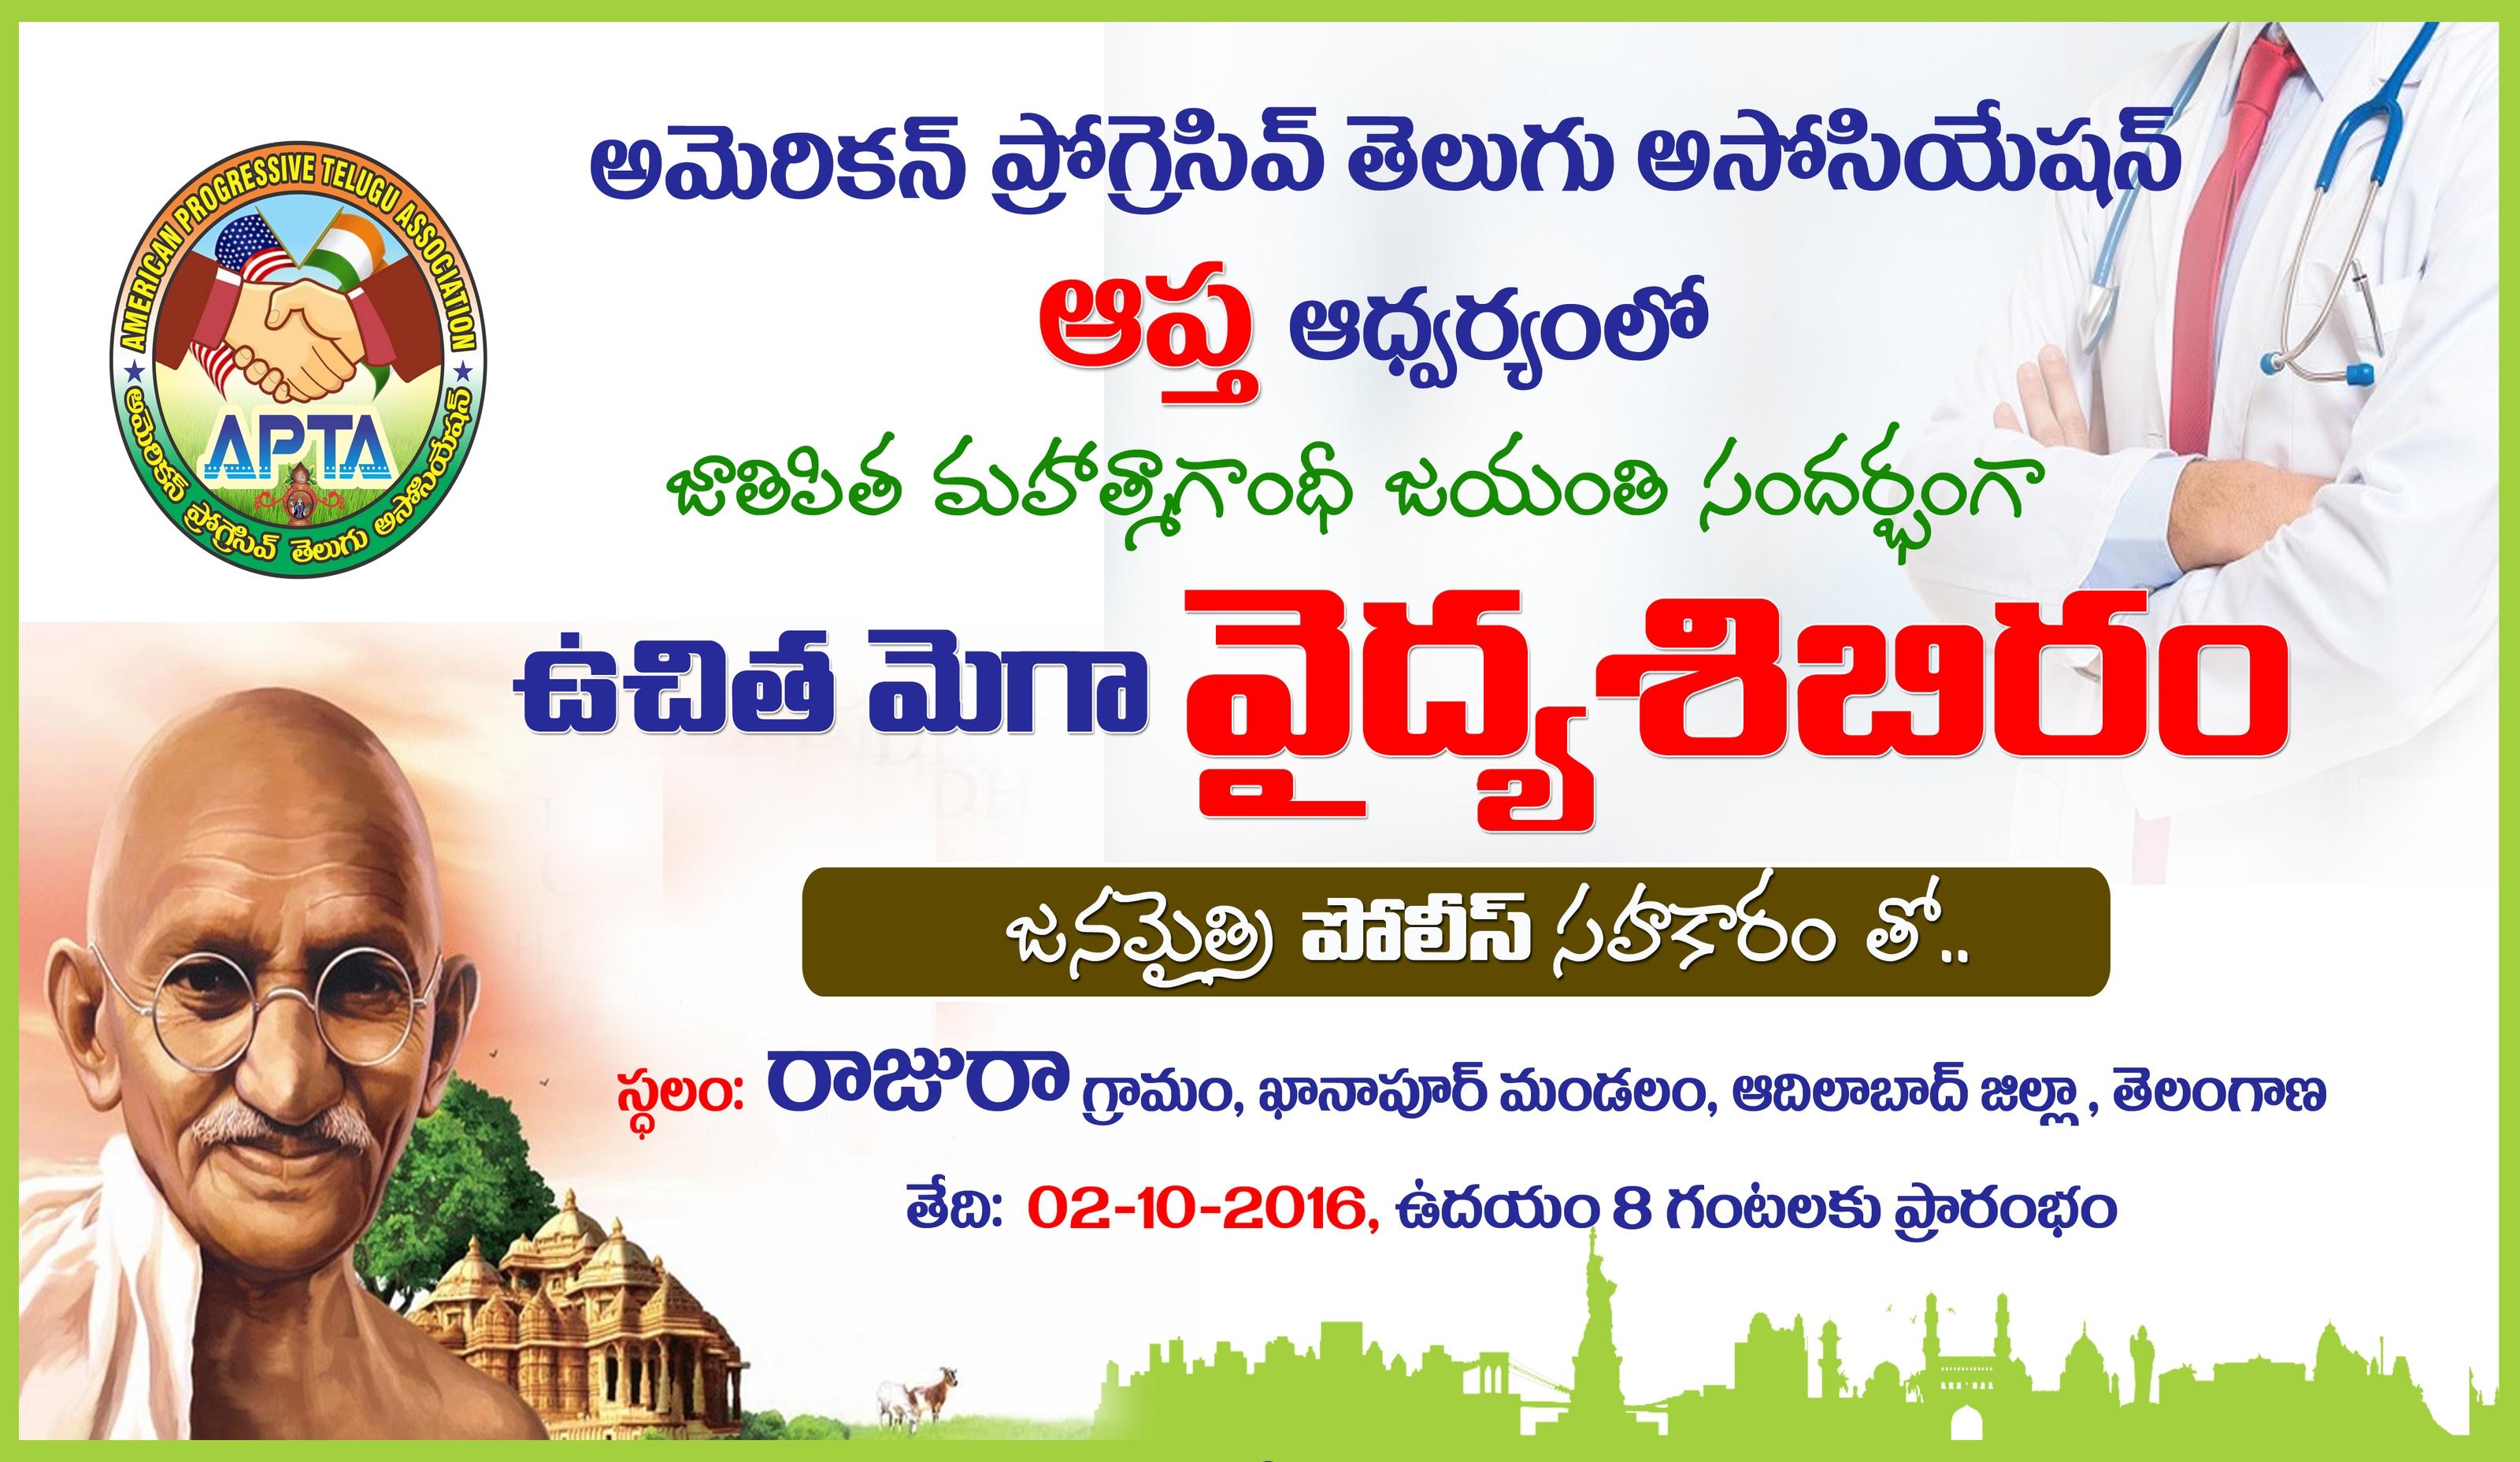 APTA Free Mega Medical Camp at Adilabad Dt, Telangana